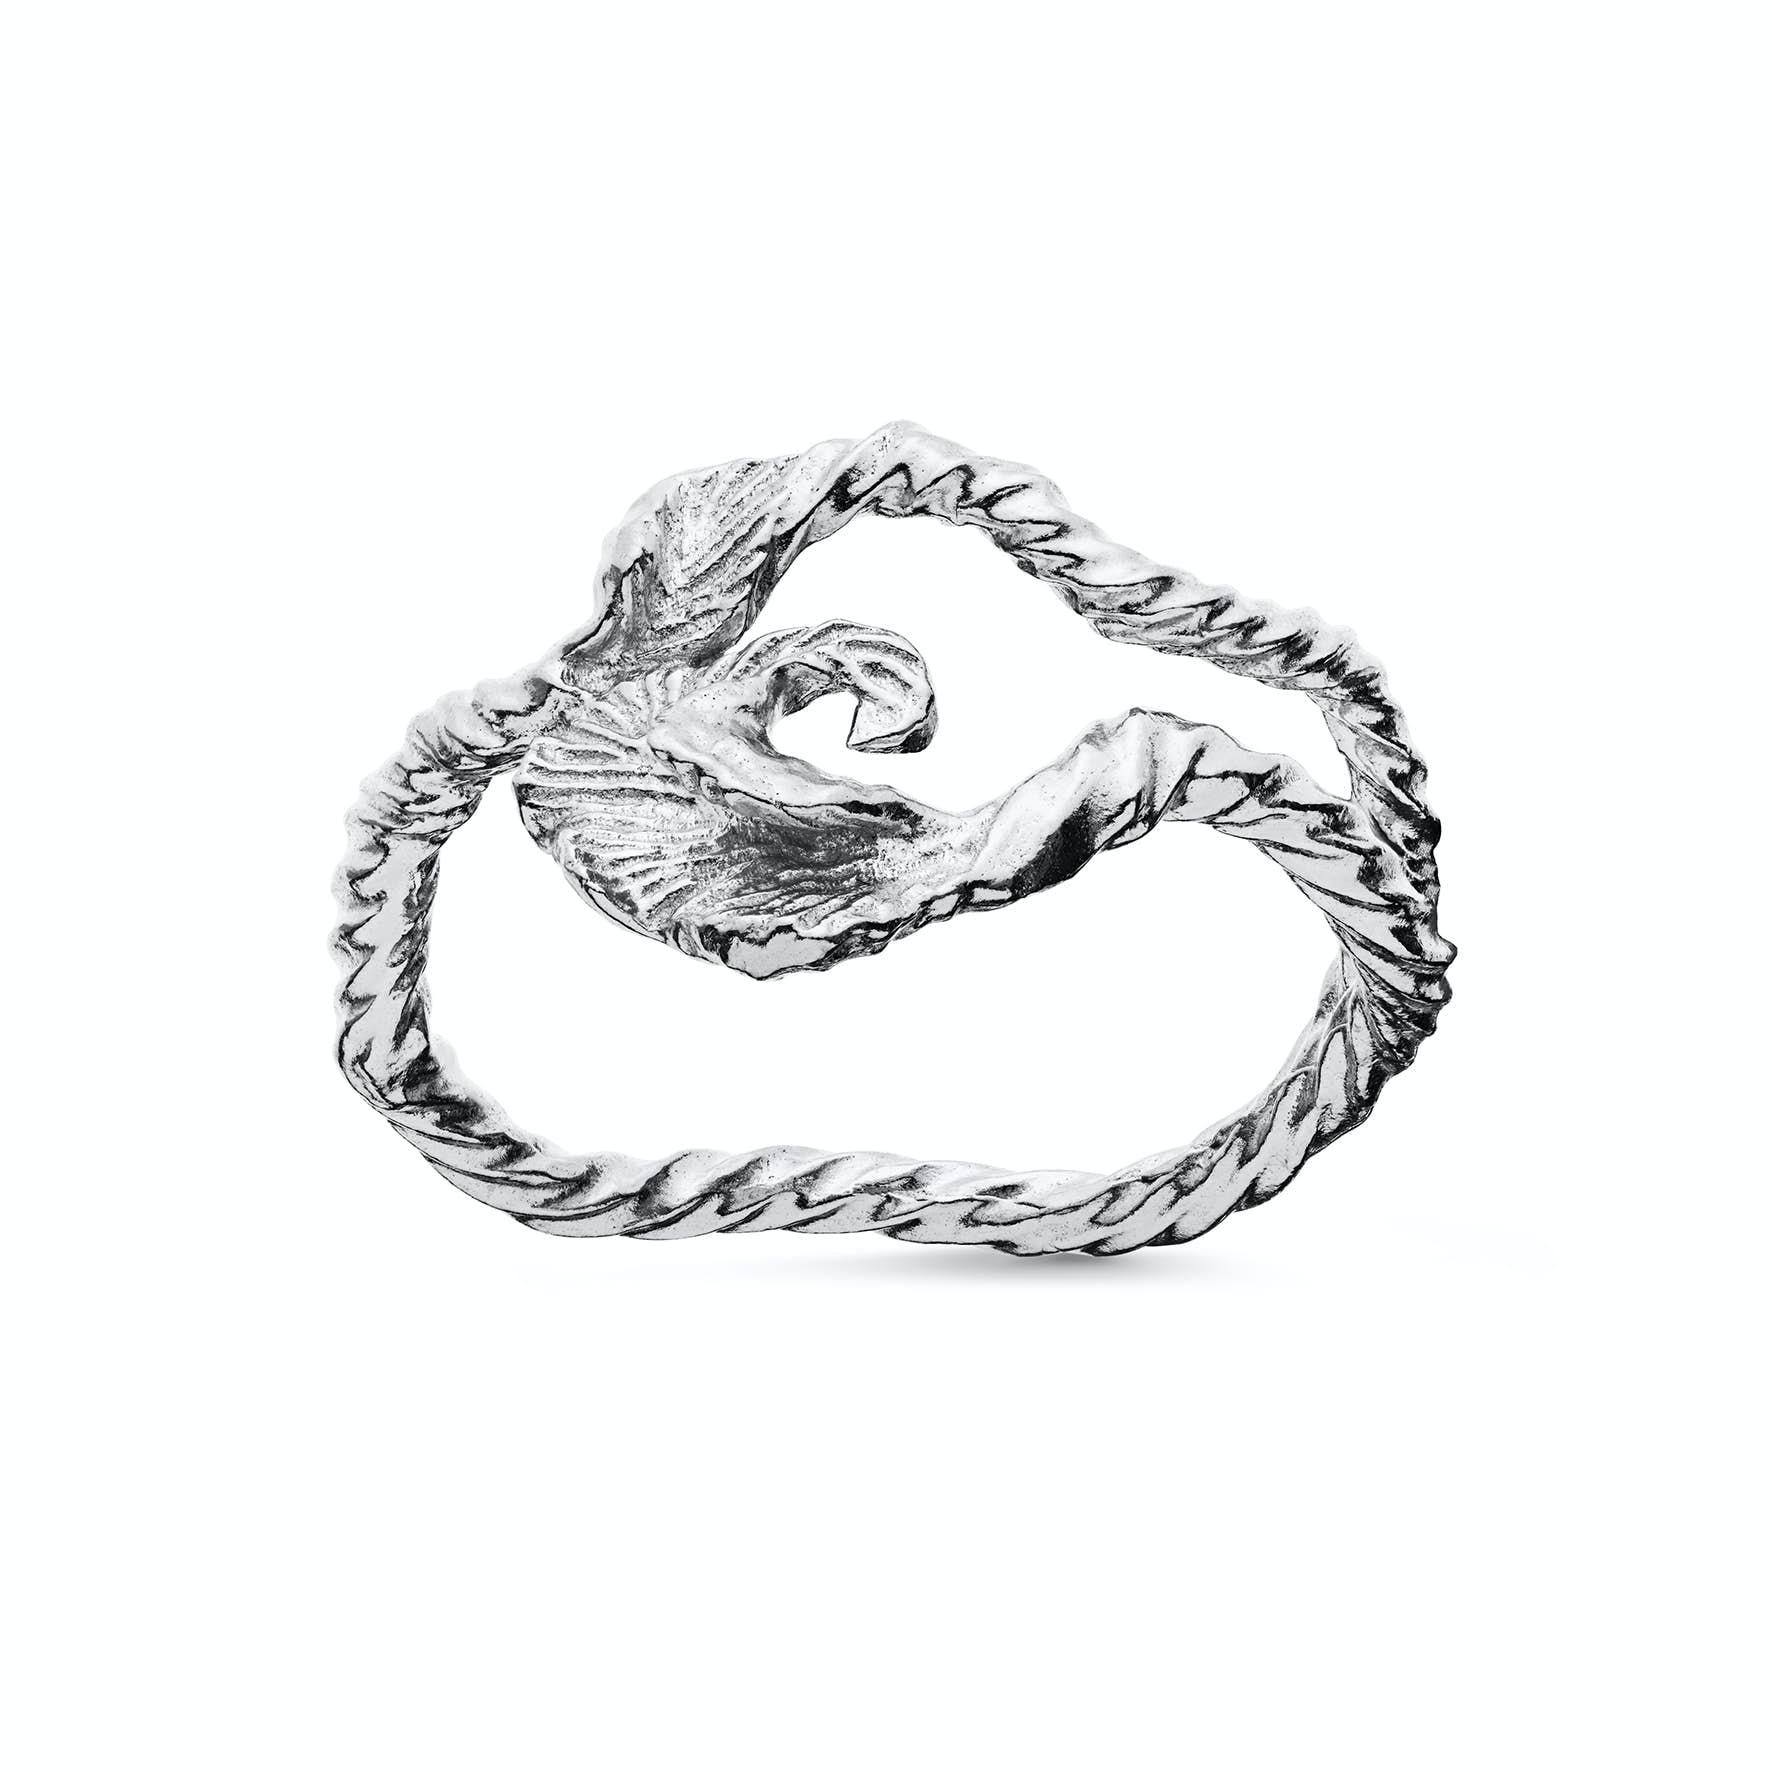 Esol Ring fra Maanesten i Sølv Sterling 925